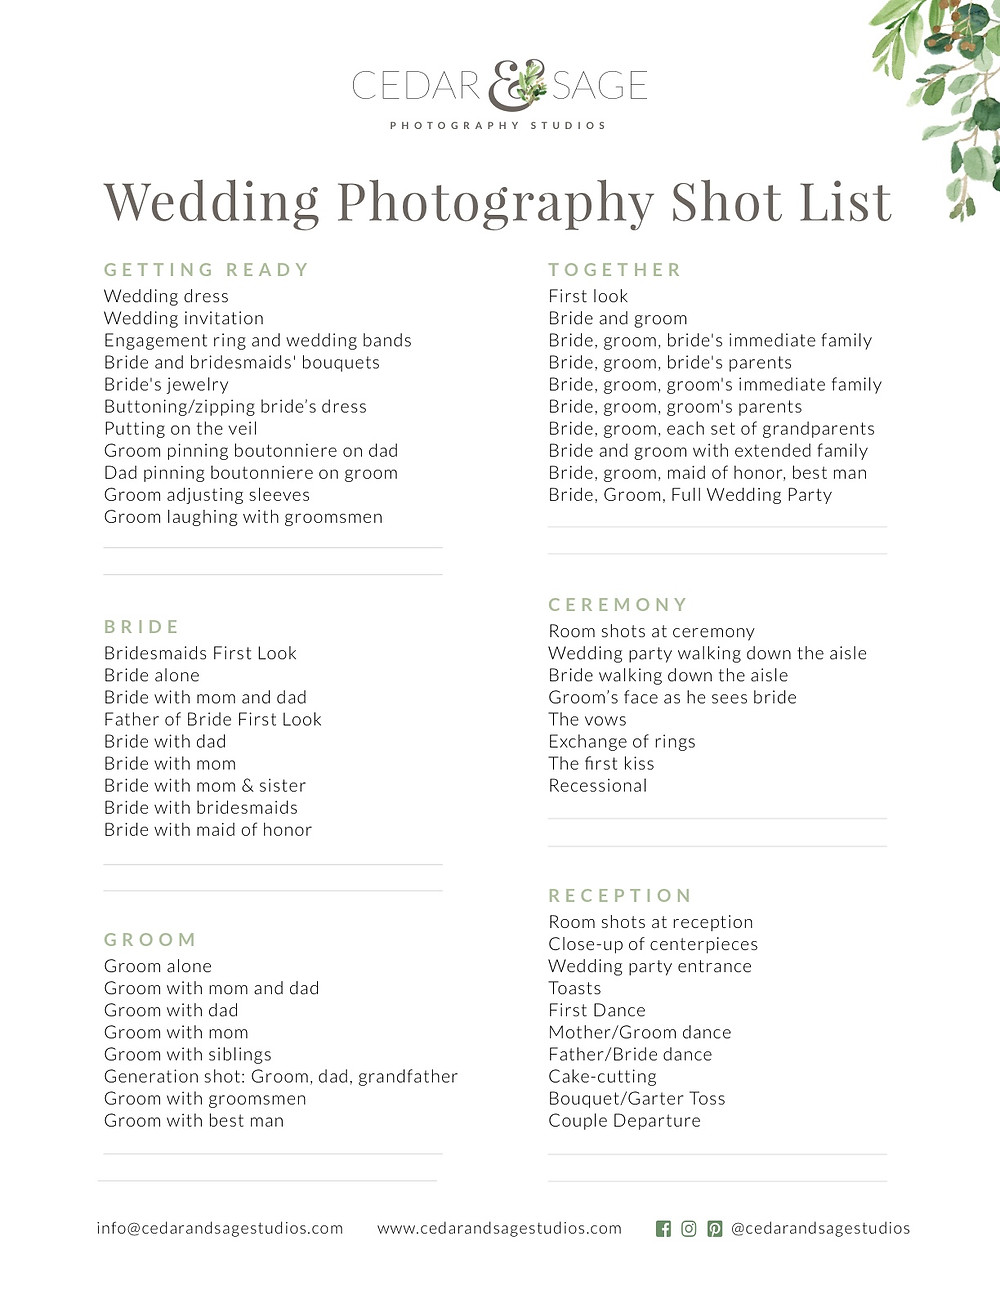 Downloadable Wedding Photography Shot List From Cedar & Sage Studios